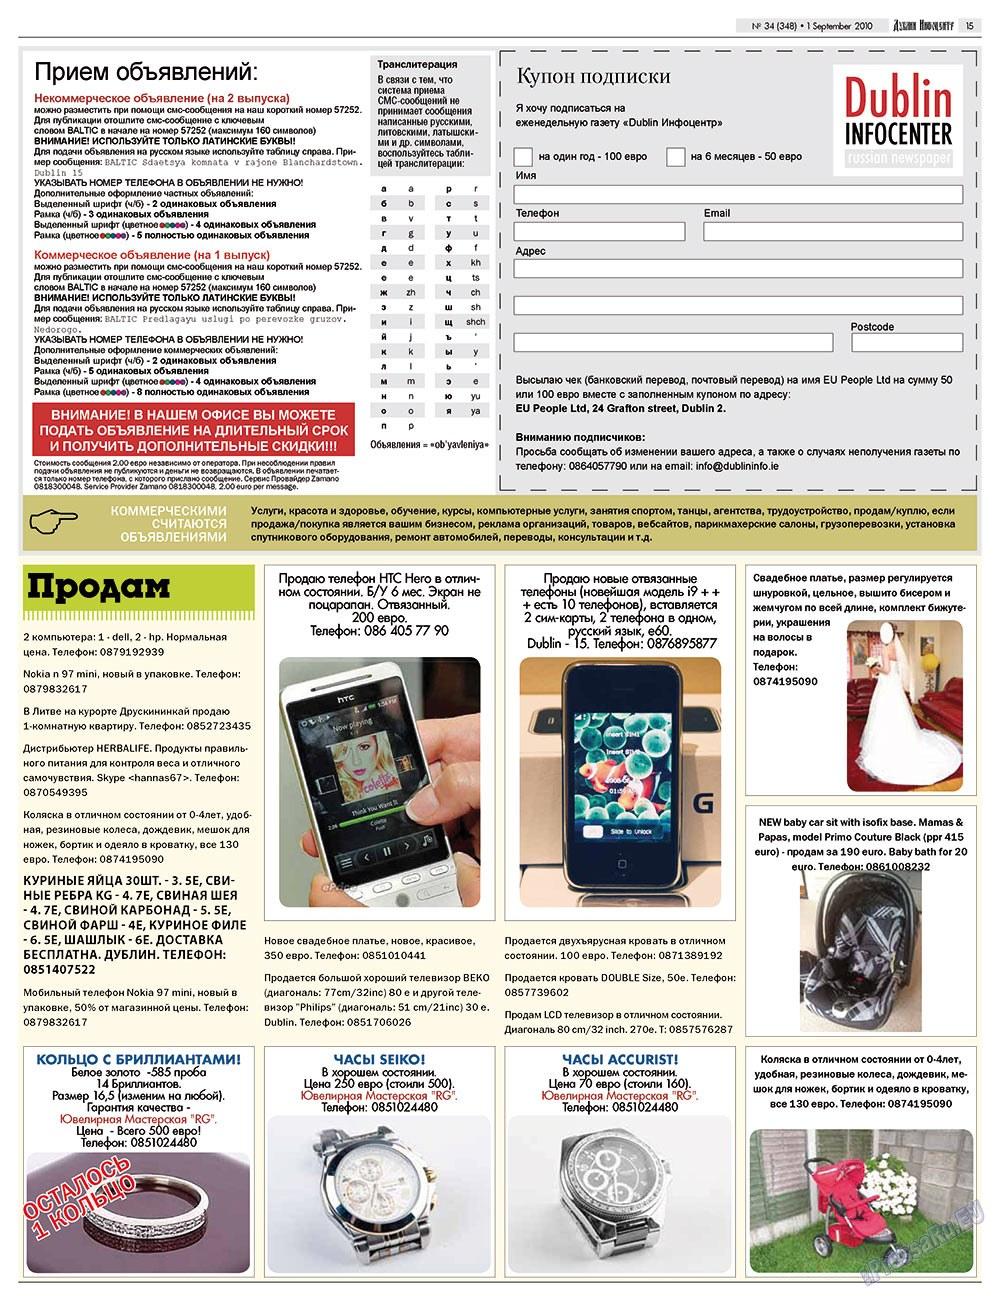 Дублин инфоцентр (газета). 2010 год, номер 34, стр. 15